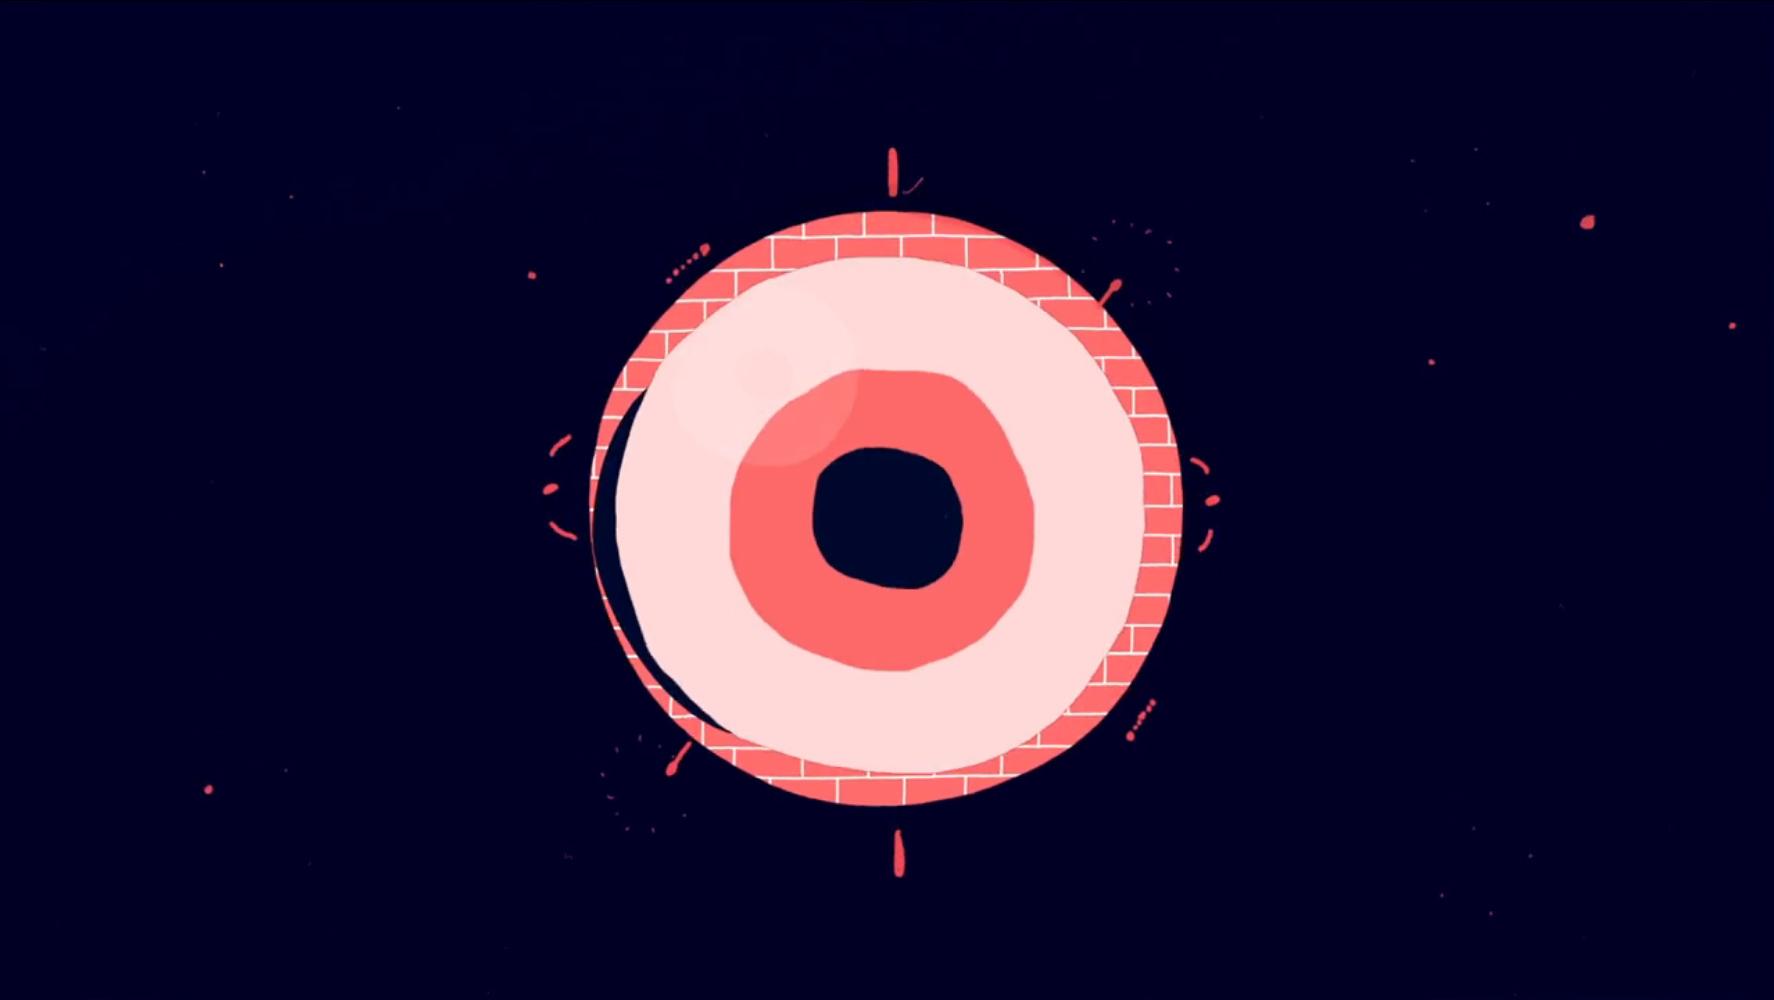 Waxeye Teaser 2014 / Tom McCarten